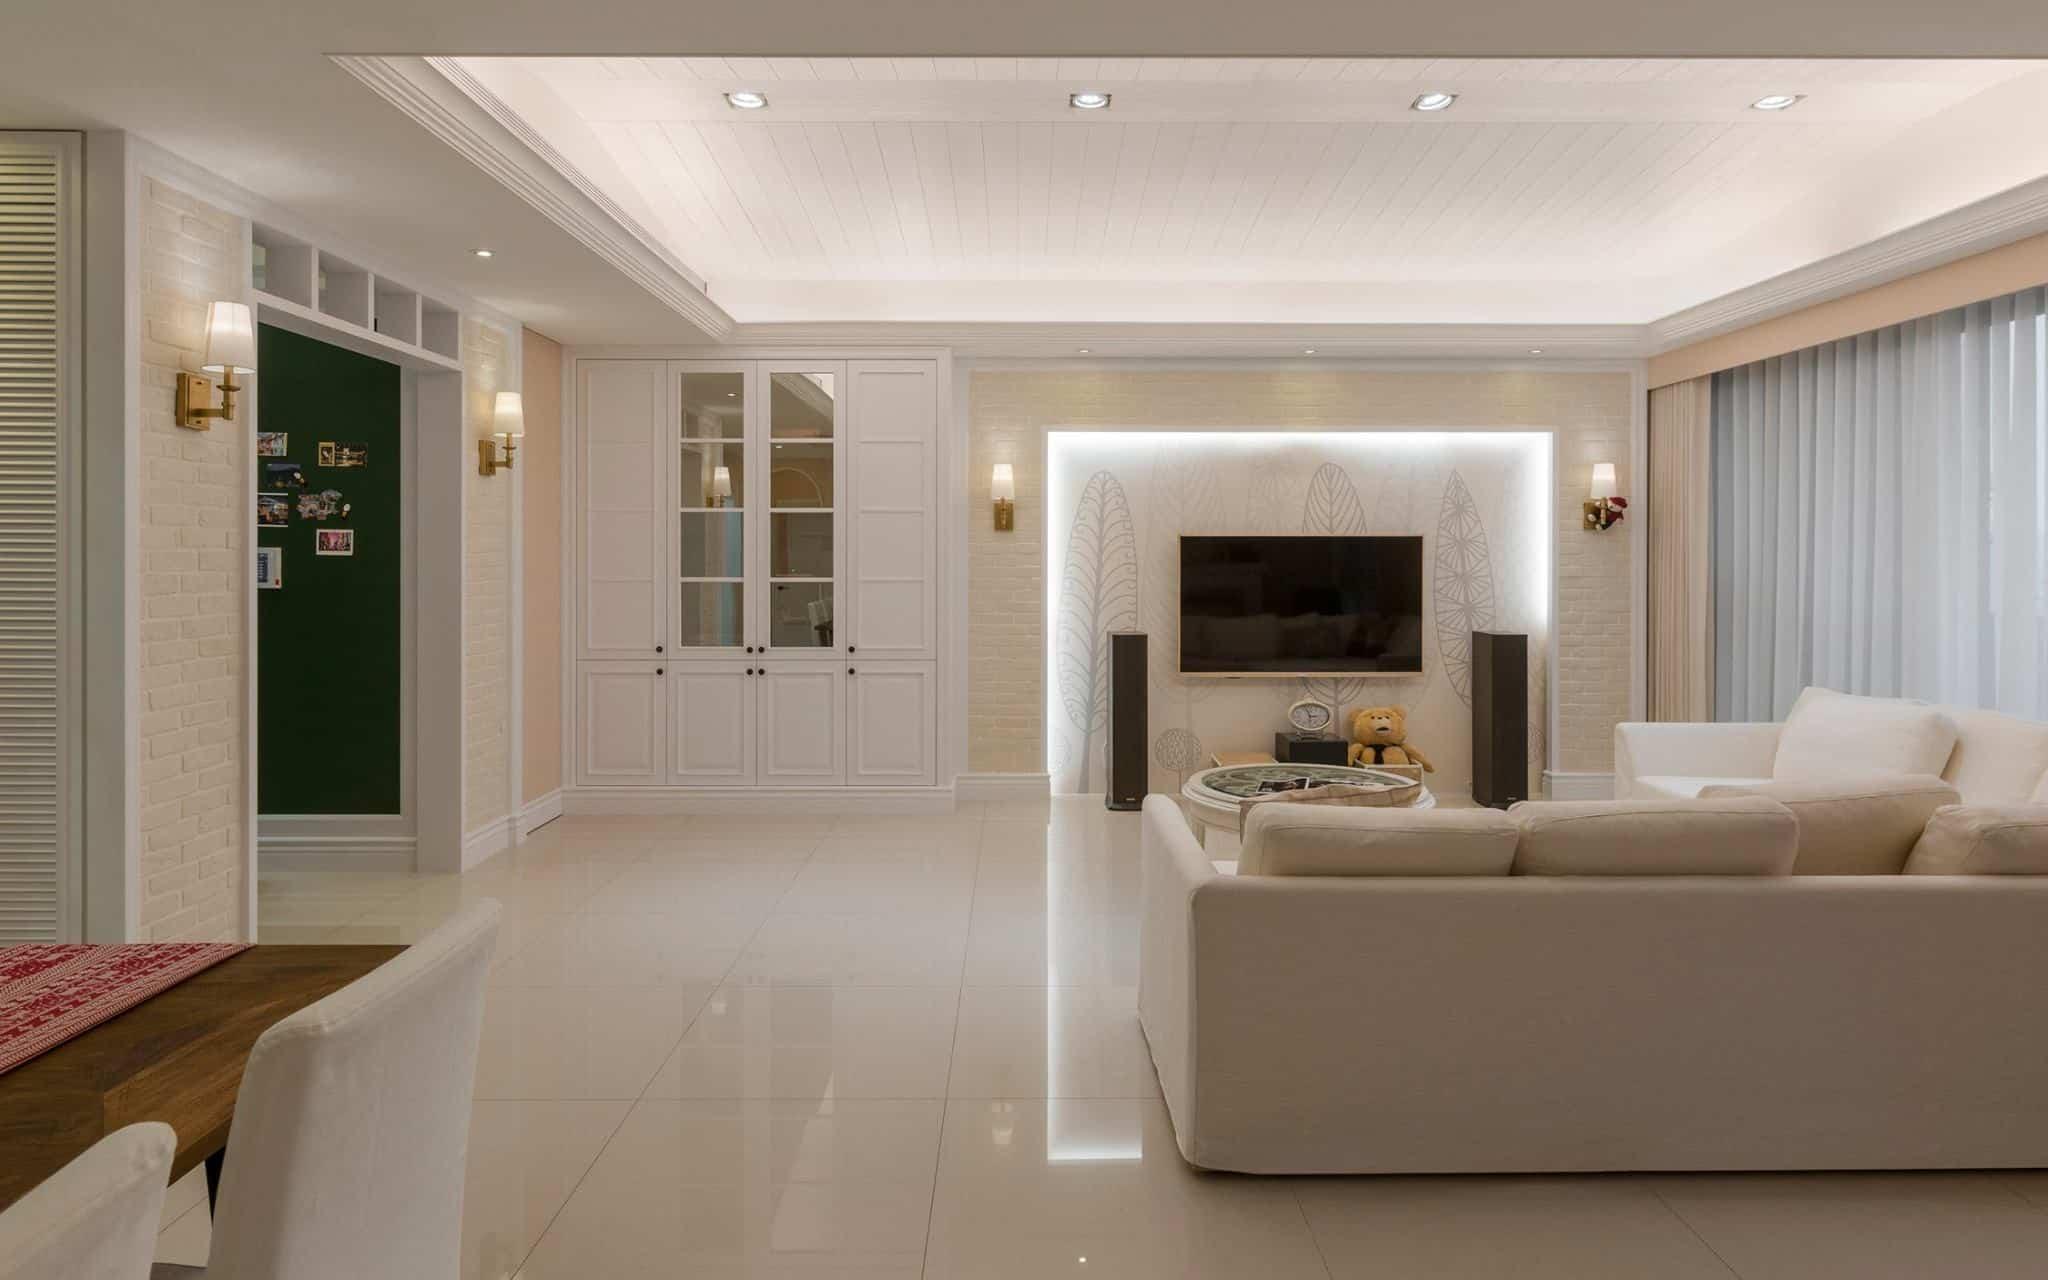 thiet-ke-noi-that-chung-cu-cau-dien-3 Thiết kế nội thất chung cư Cầu Diễn - A. Khoa